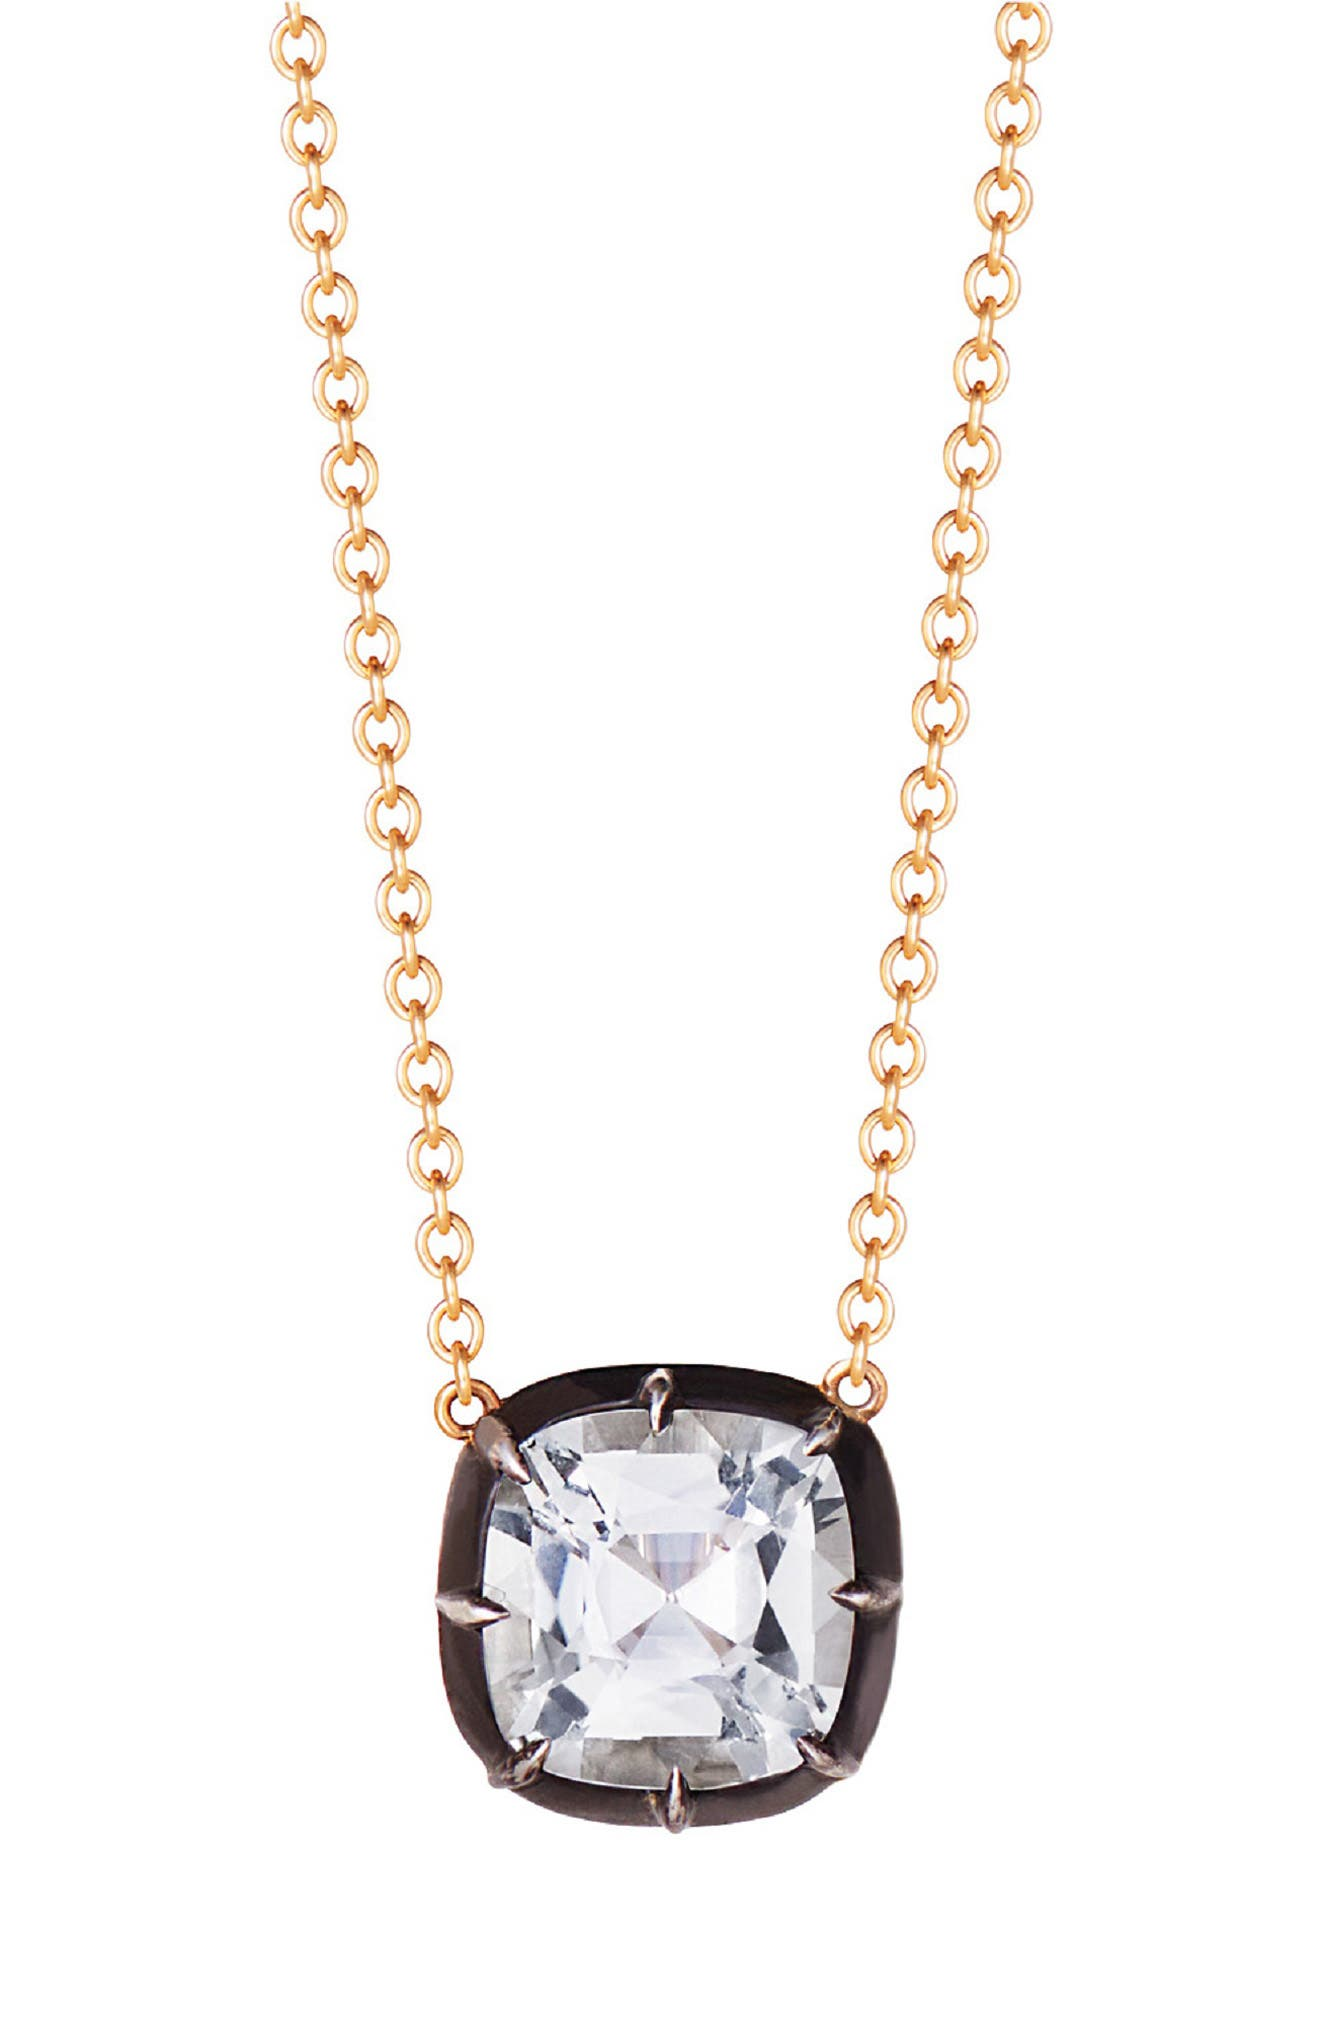 Collet Cushion White Topaz Pendant Necklace